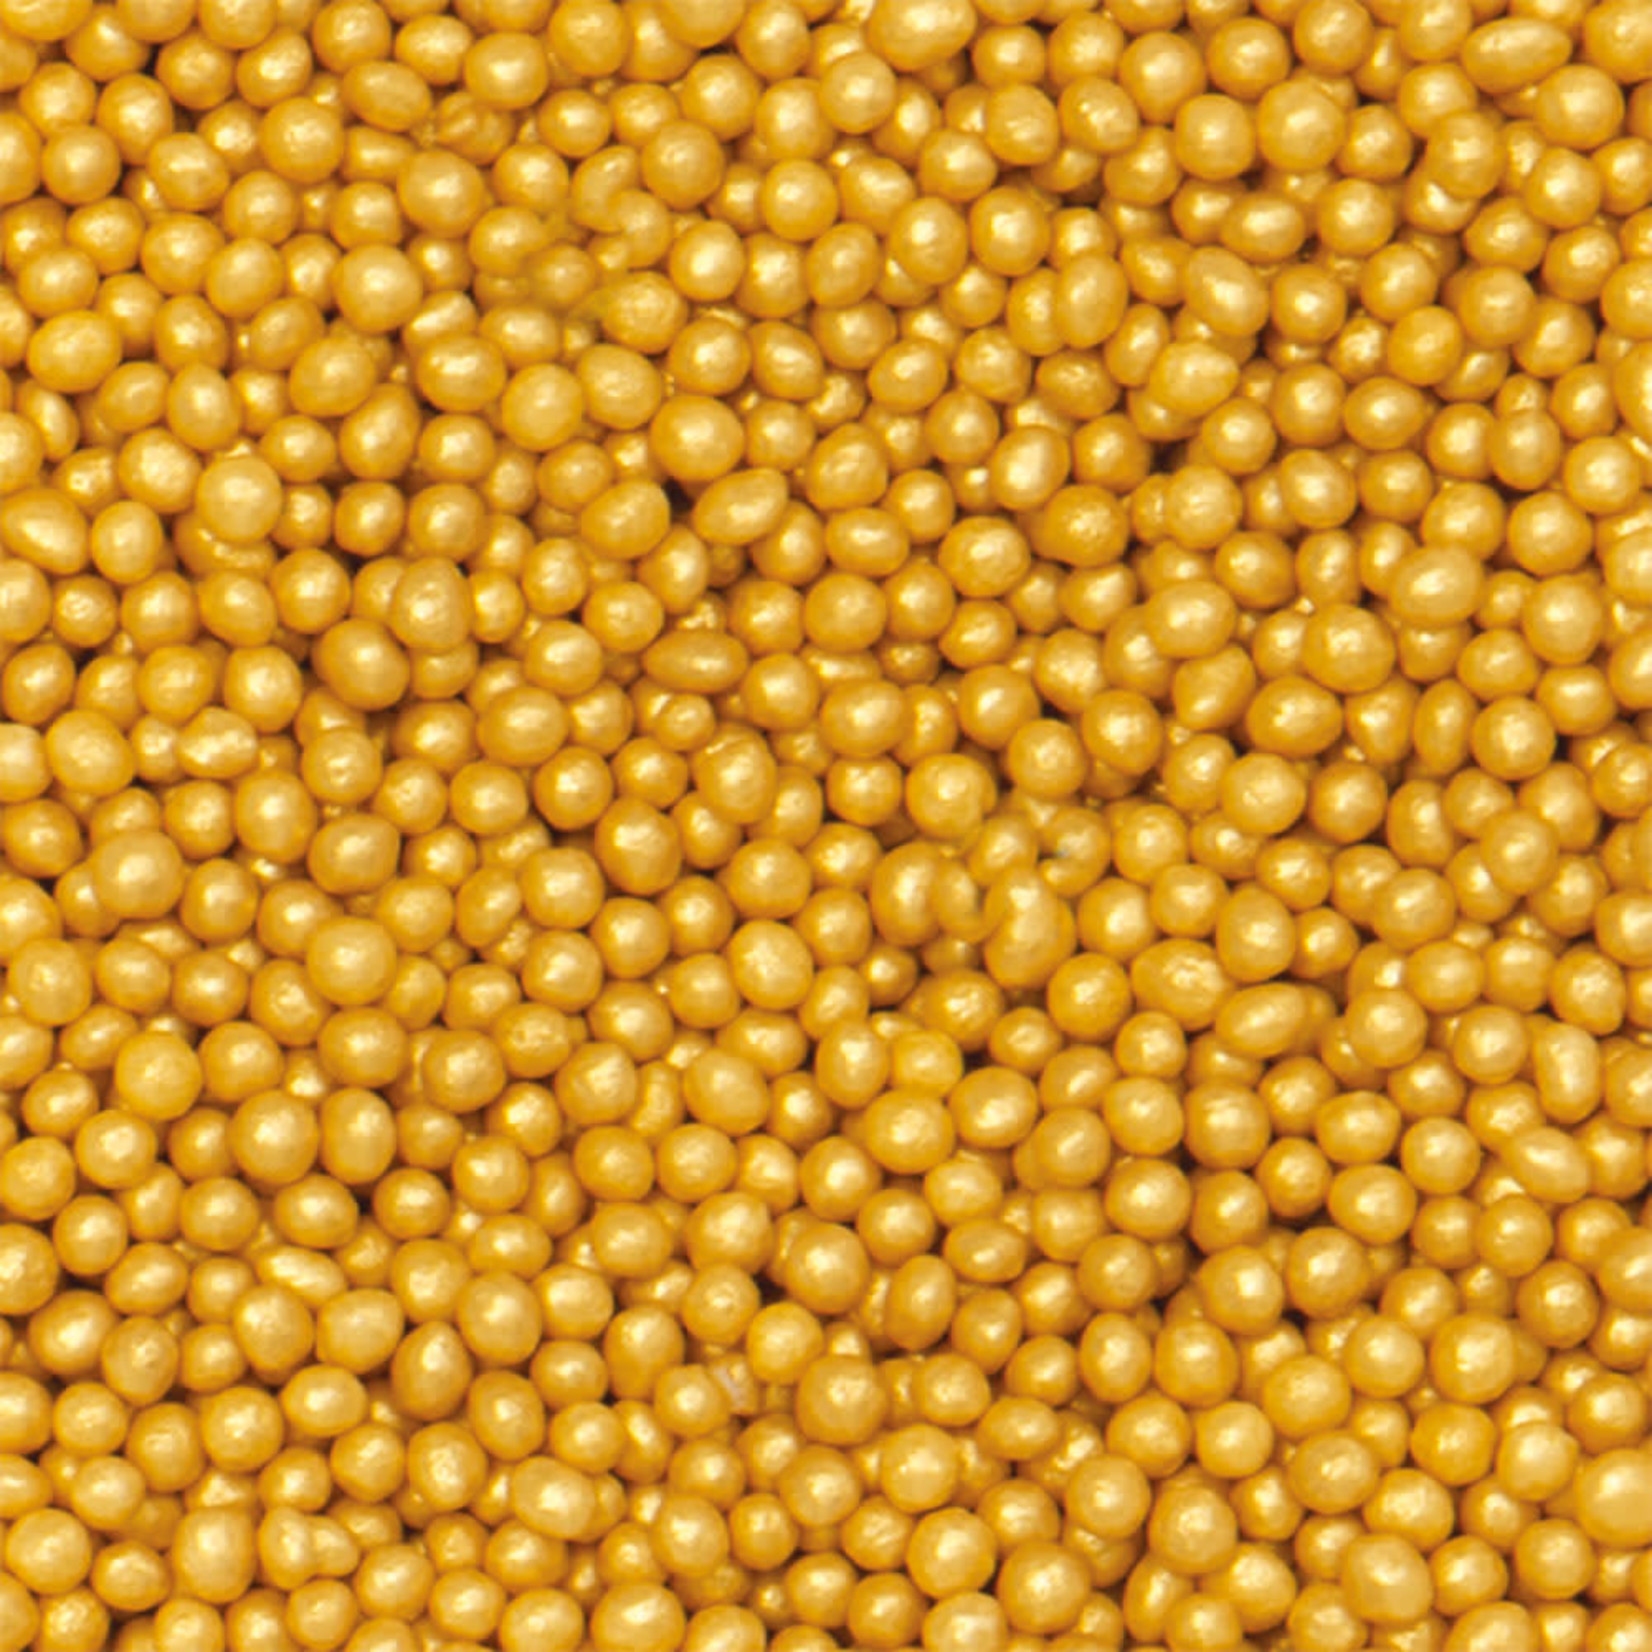 Decora Decoratieset goud 85g